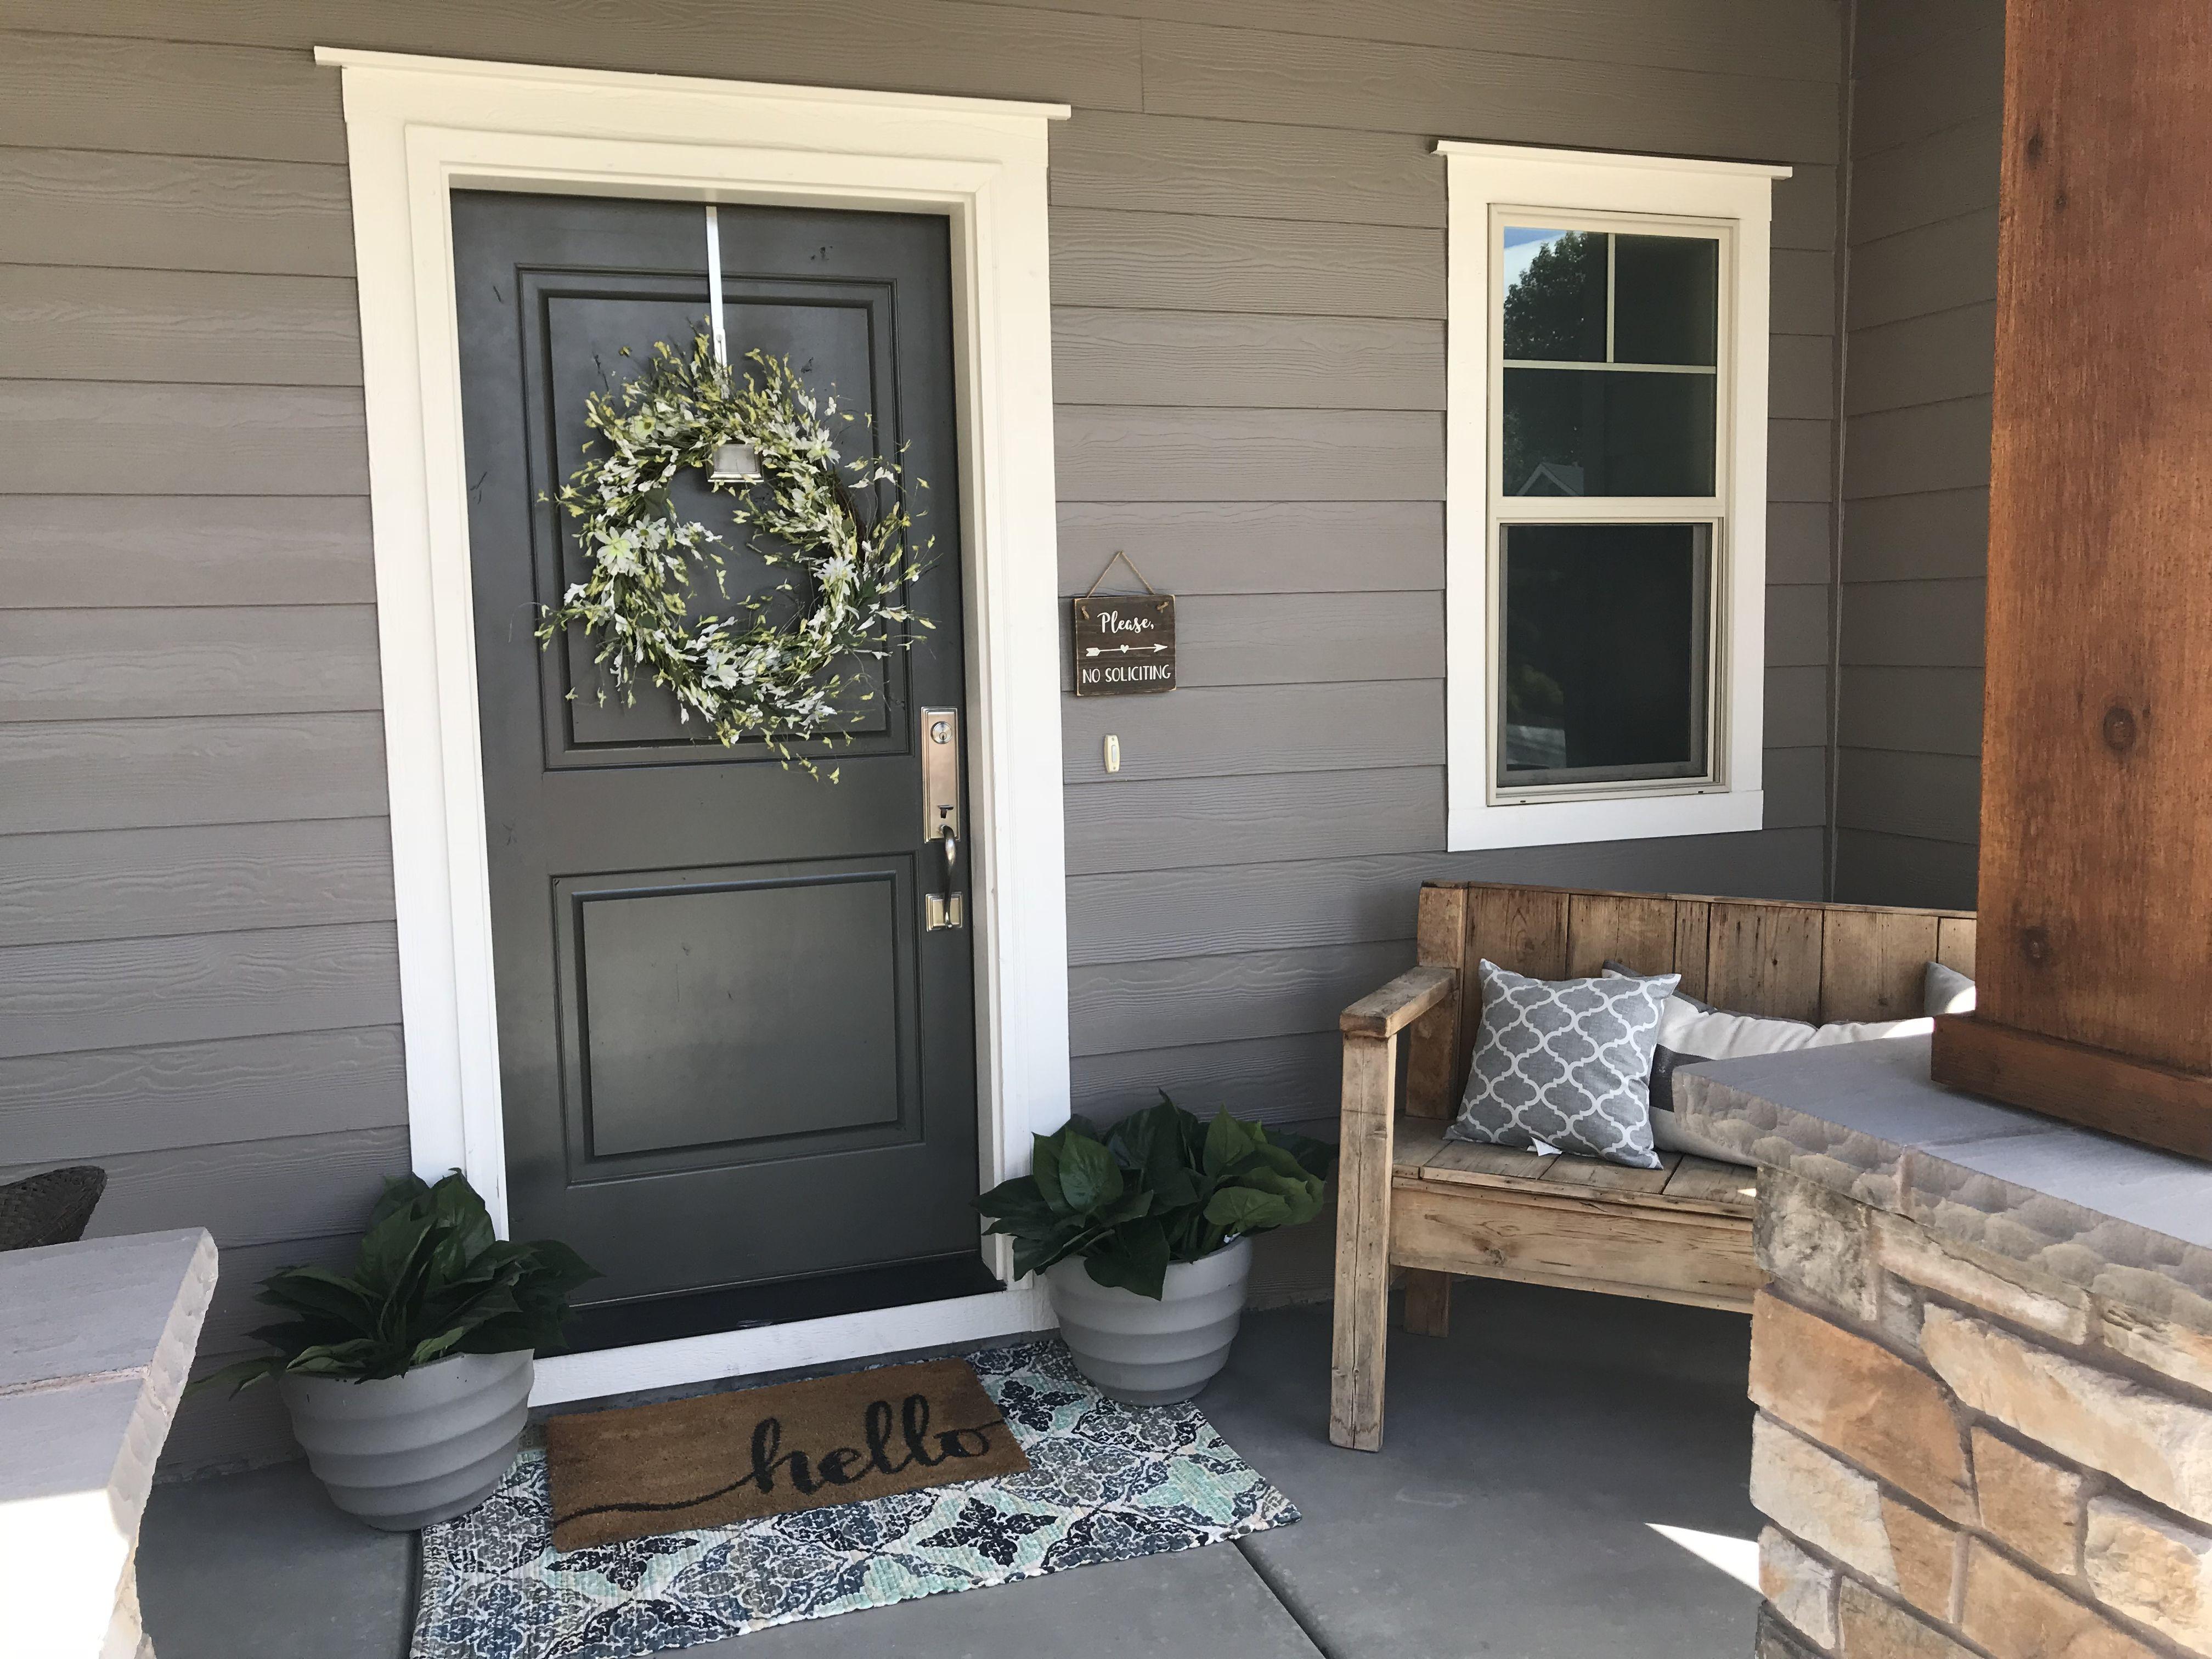 Cute Front Door Entrance Front Entrance Decor Entrance Decor